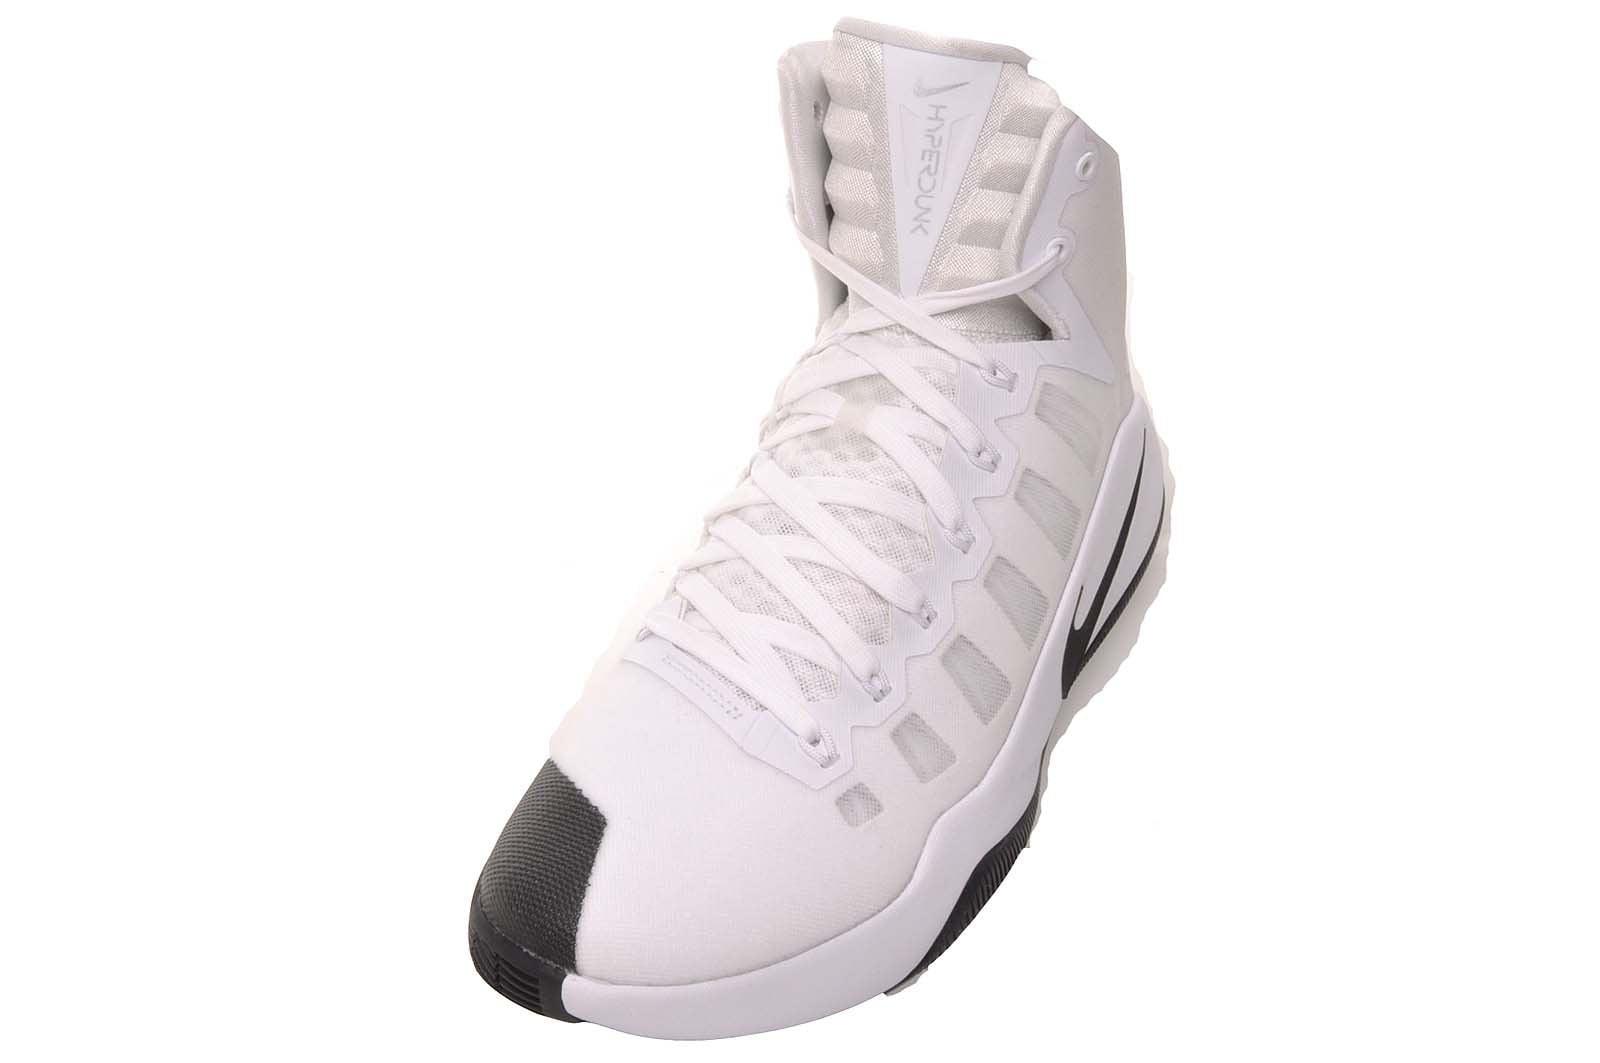 133a04091d8e ... amazon nike mens hyperdunk 2016 tb basketball shoes 844368 100 white  walmart 655b6 2e5e5